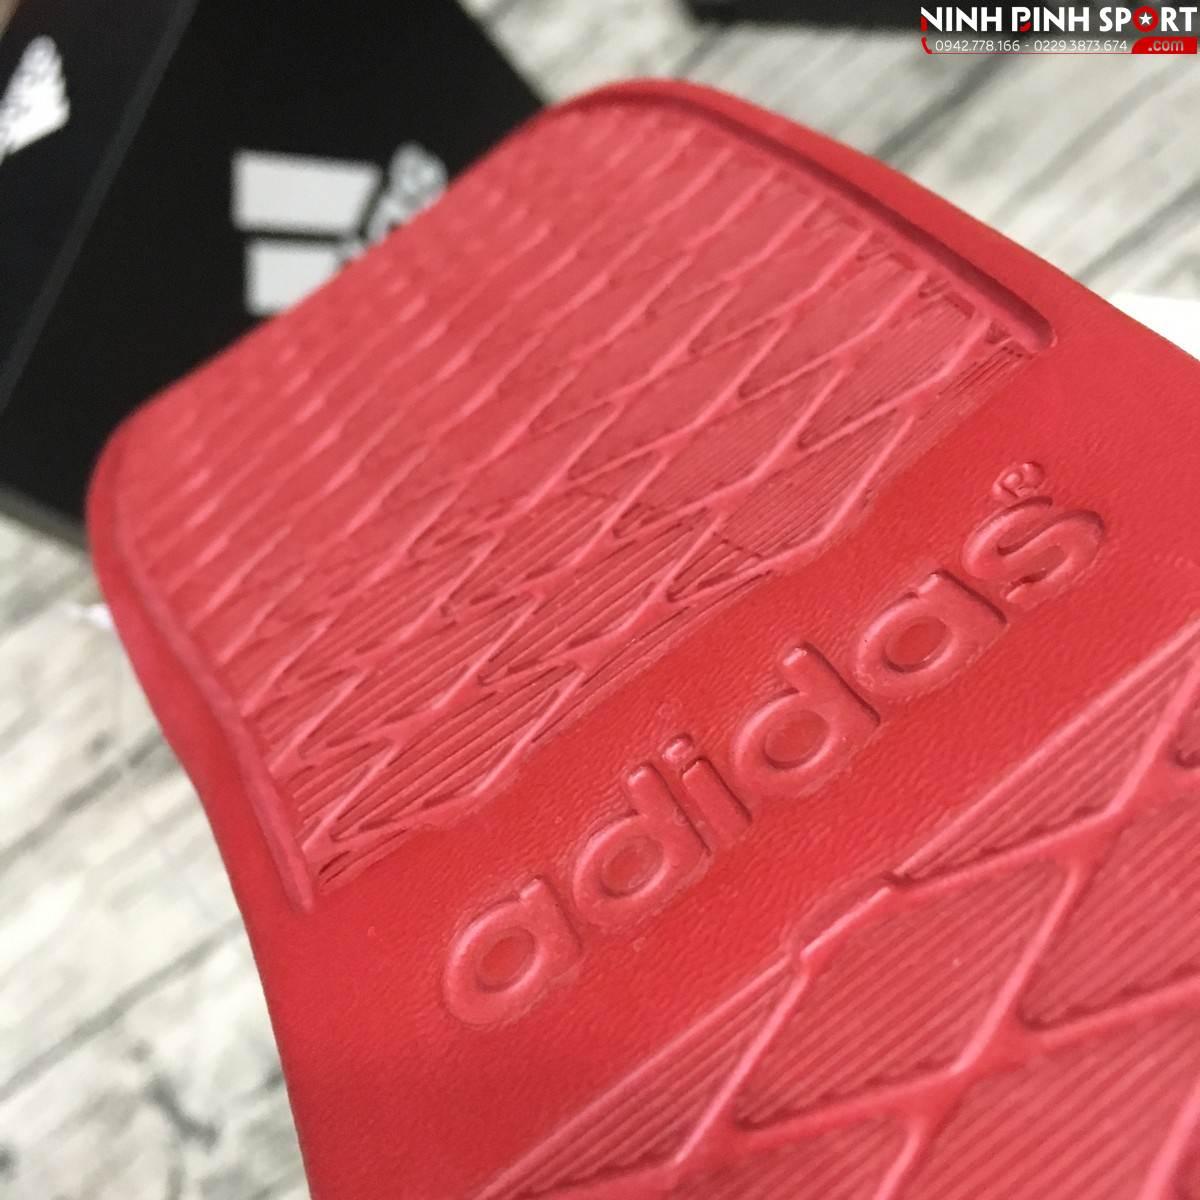 Dép Thể Thao Adidas Adilette Comfort CG3424